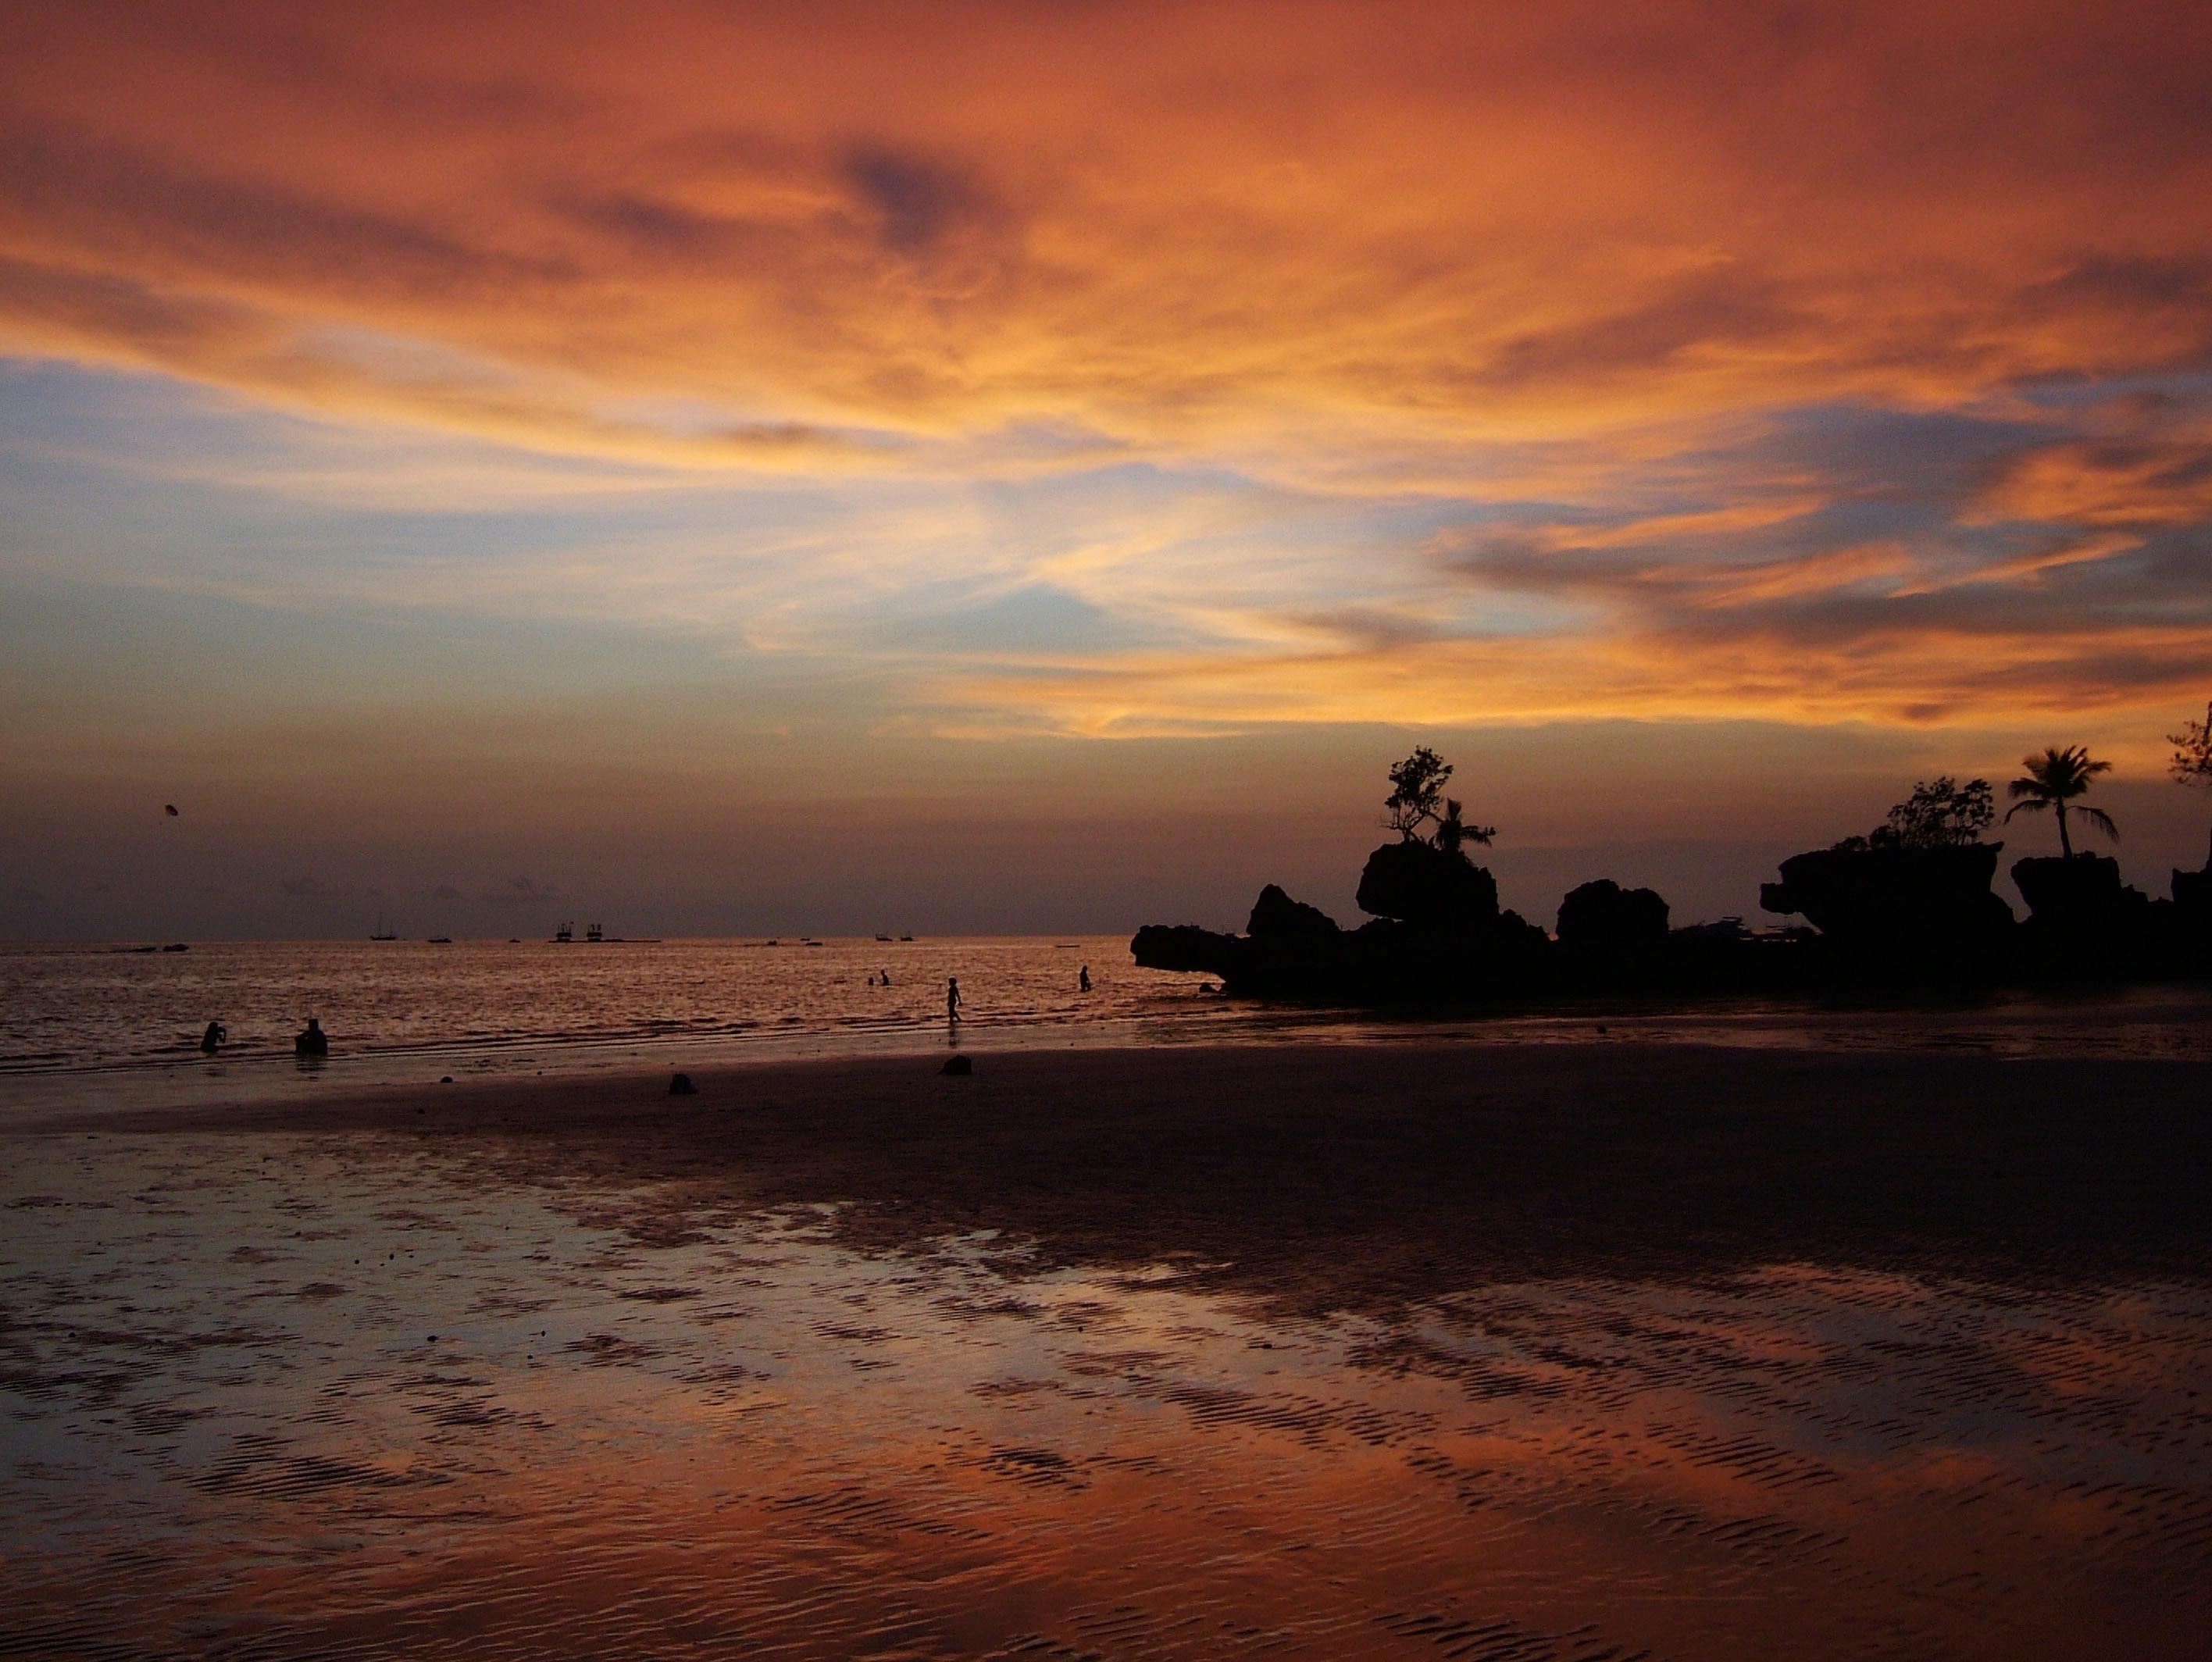 Philippines Sugar Islands Caticlan Boracay White Beach Sunset 2007 49